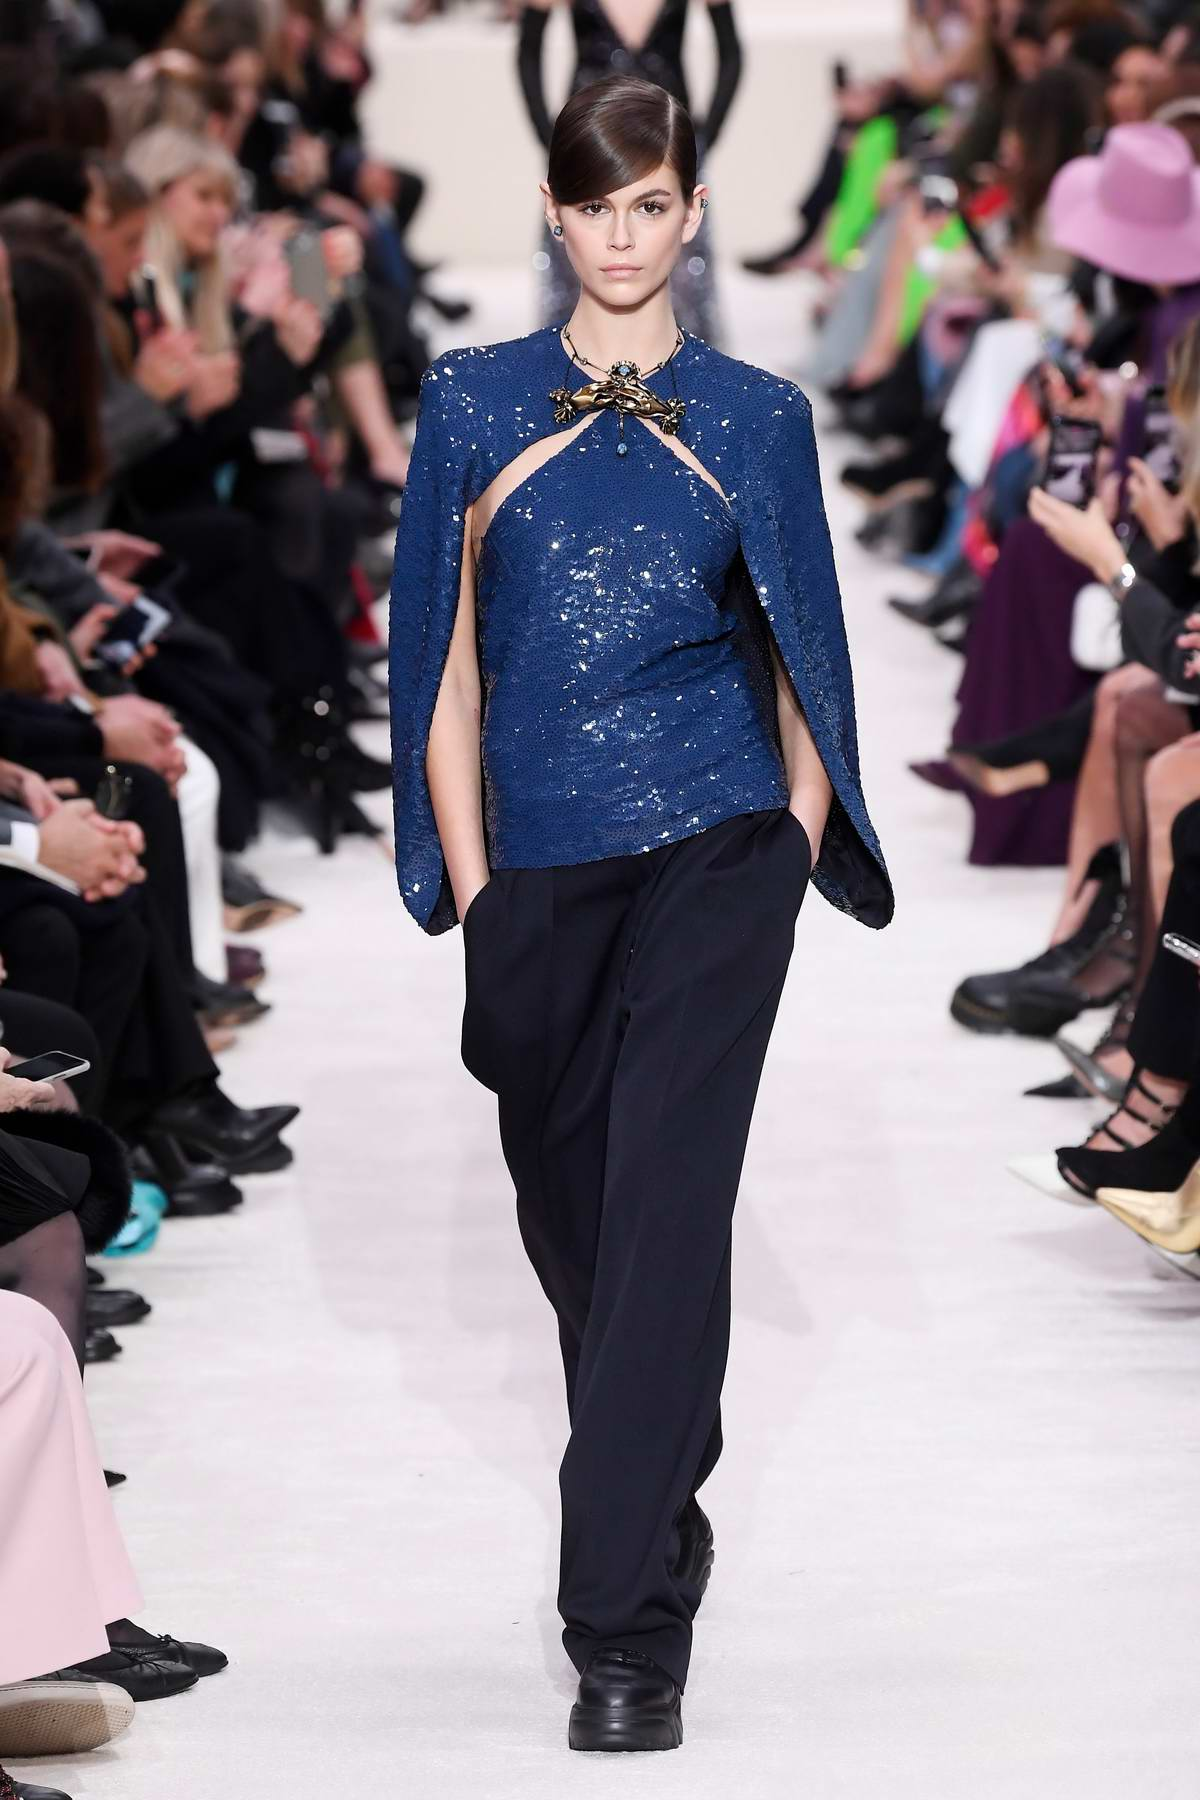 Kaia Gerber walks the runway at Valentino show, F/W 2020 during Paris Fashion Week in Paris, France